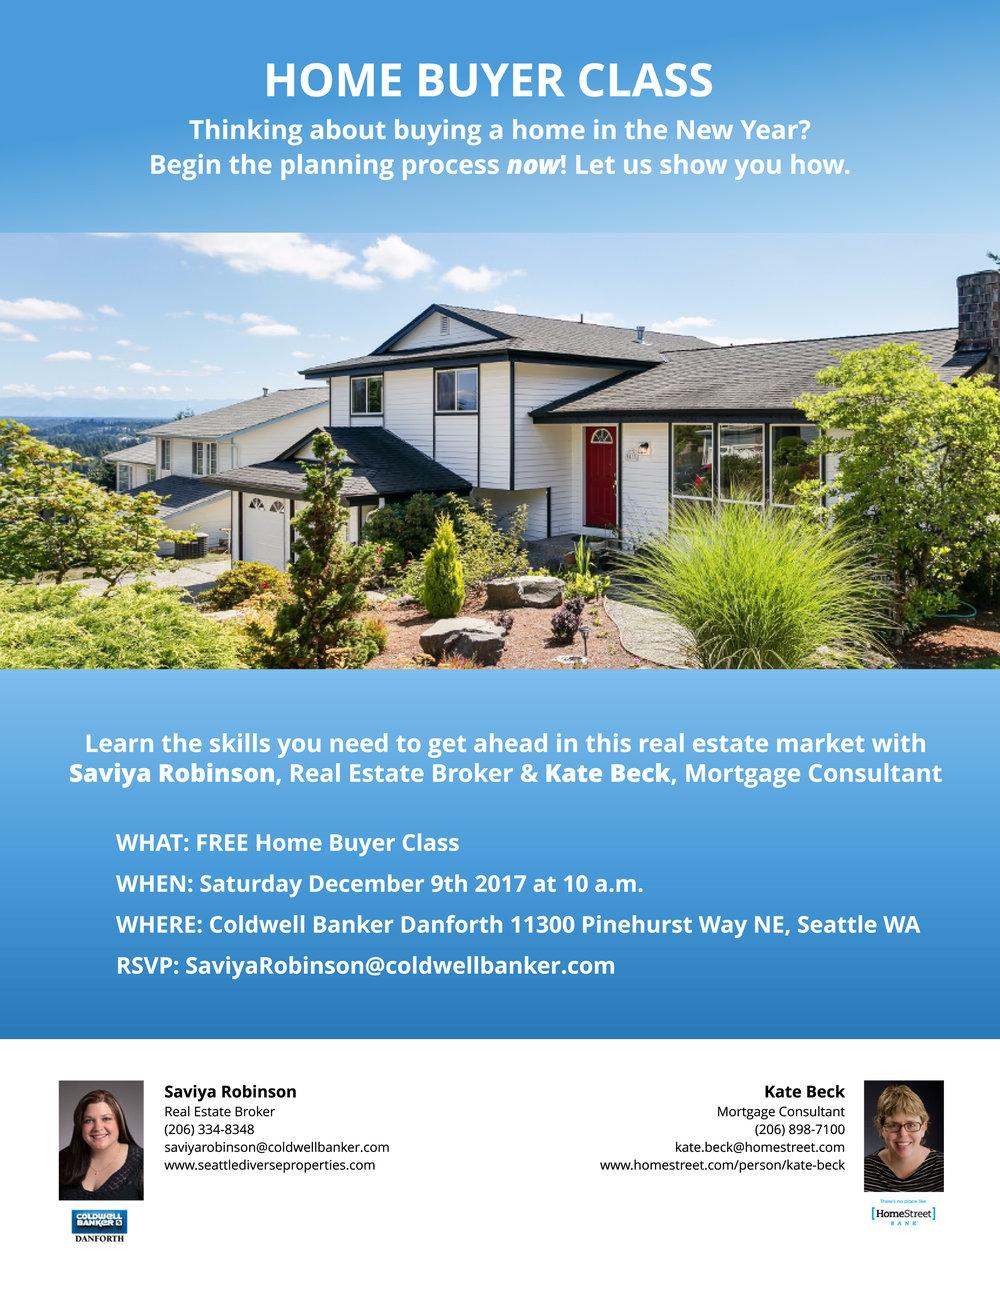 saviya-robinson-home-buyer-class-12.09.17.jpg